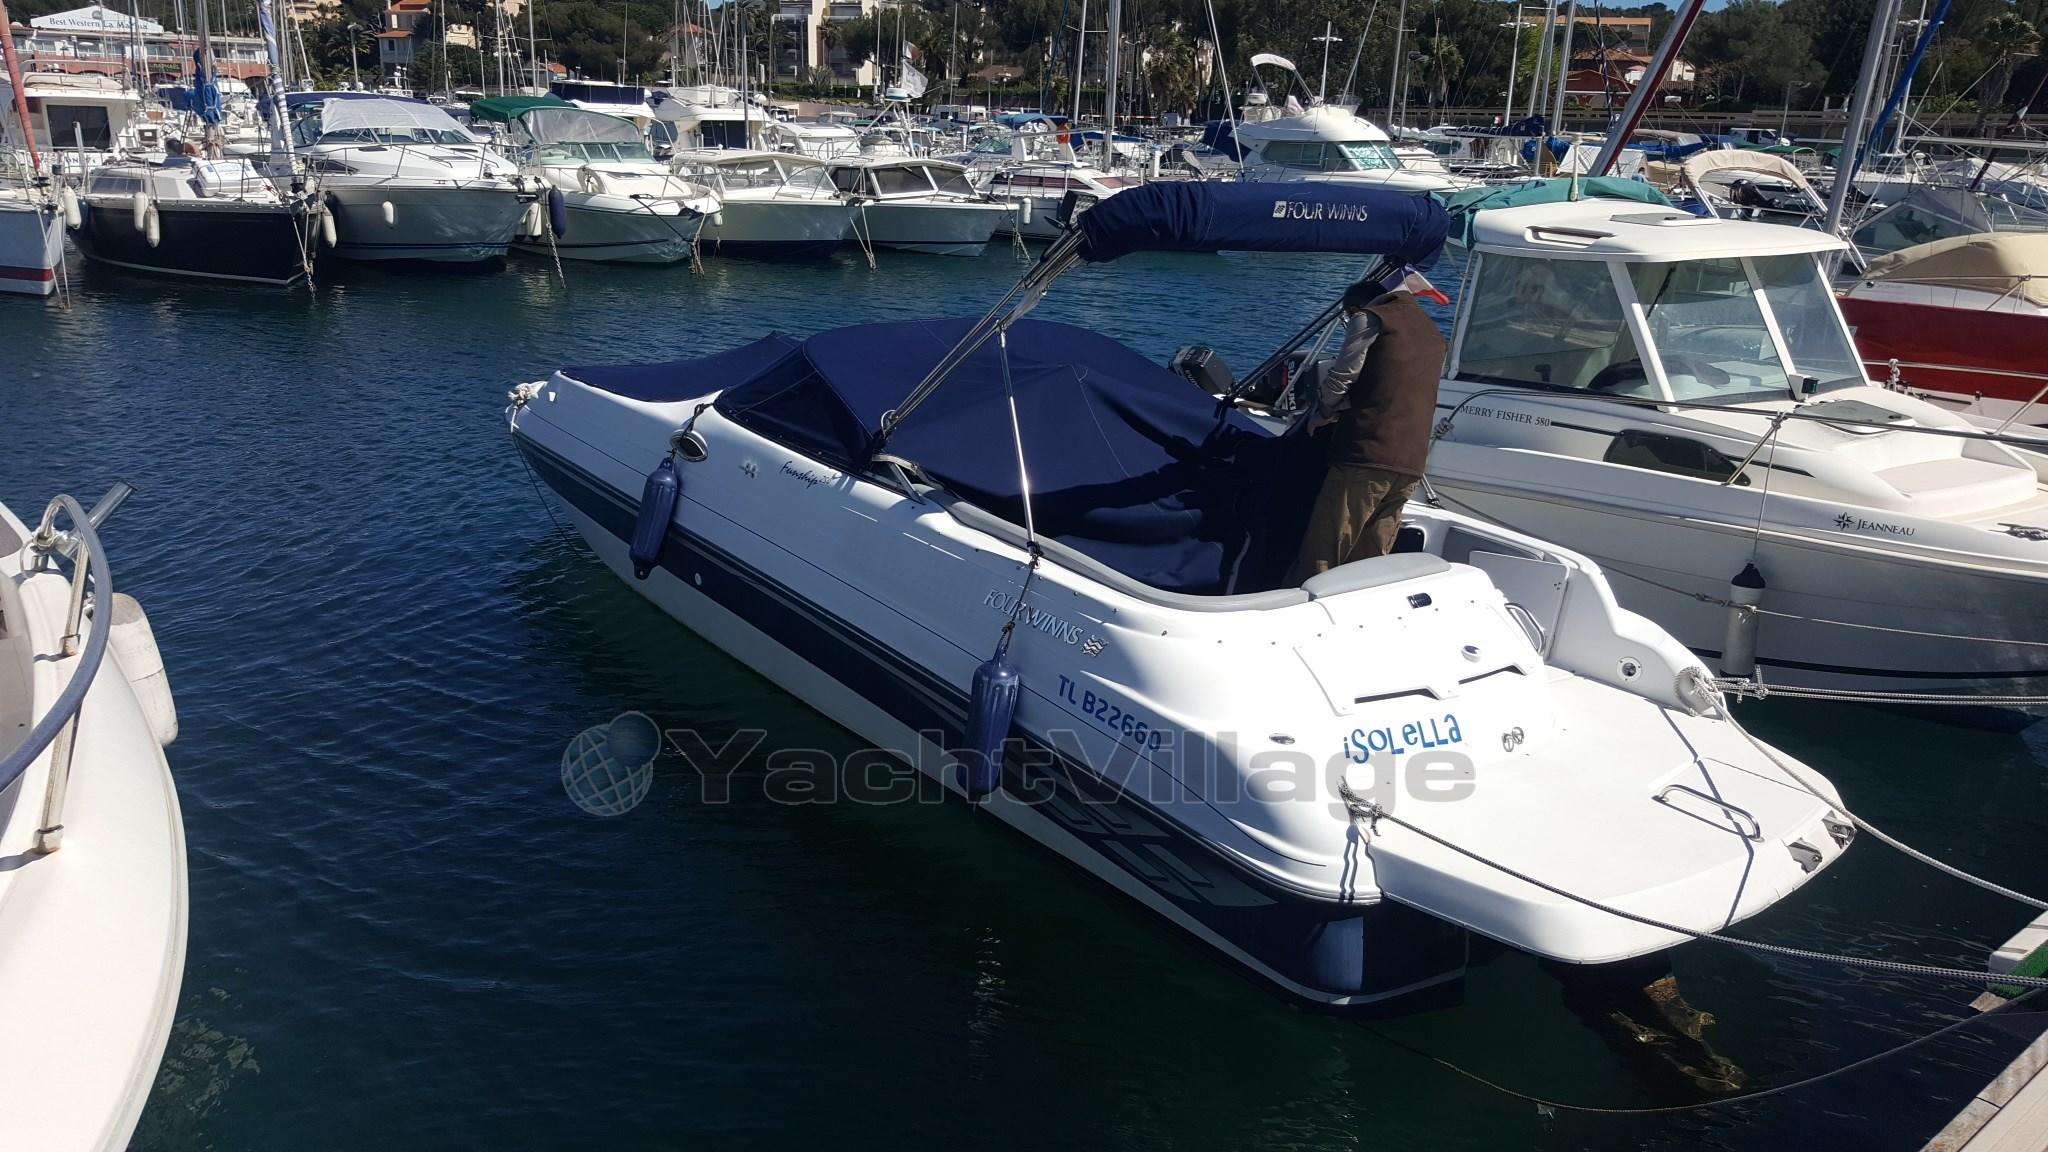 bateau_four-winns-funship-254_4051816.jpg